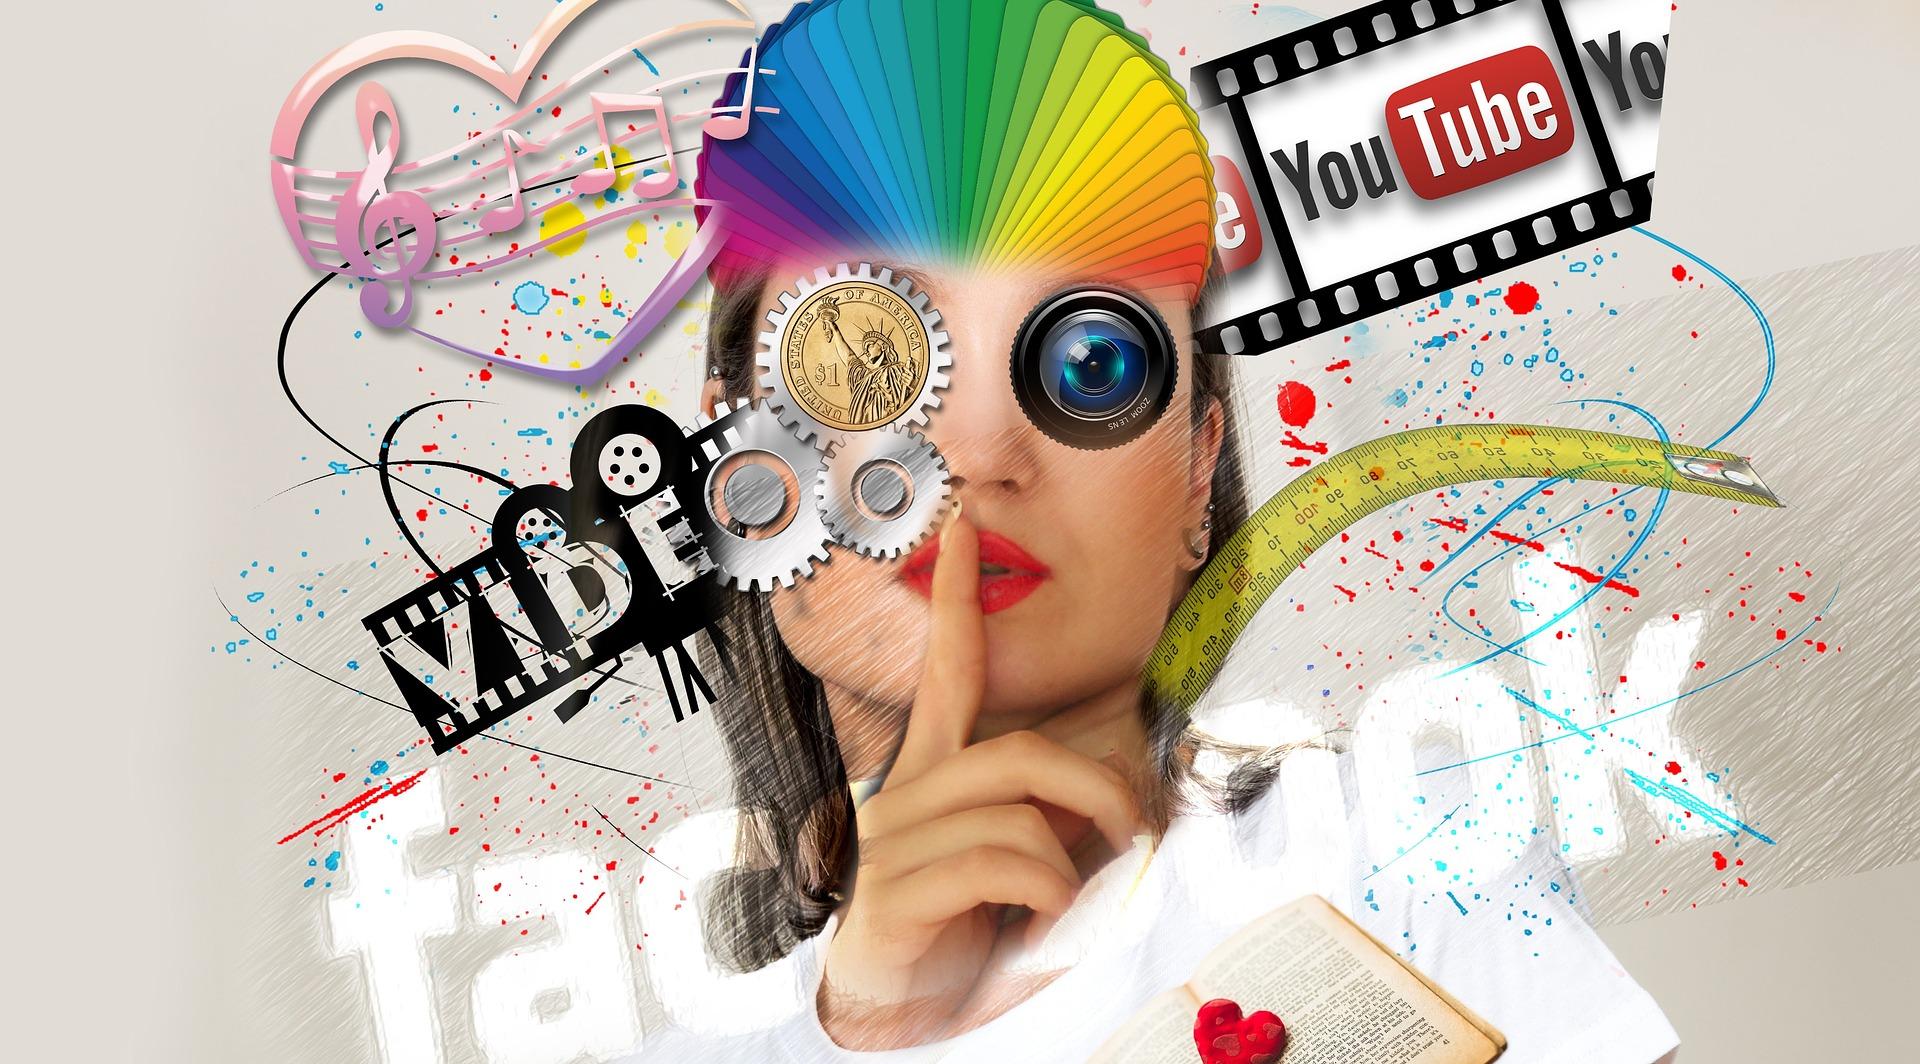 Waarom hebben Social Media zo'n ster